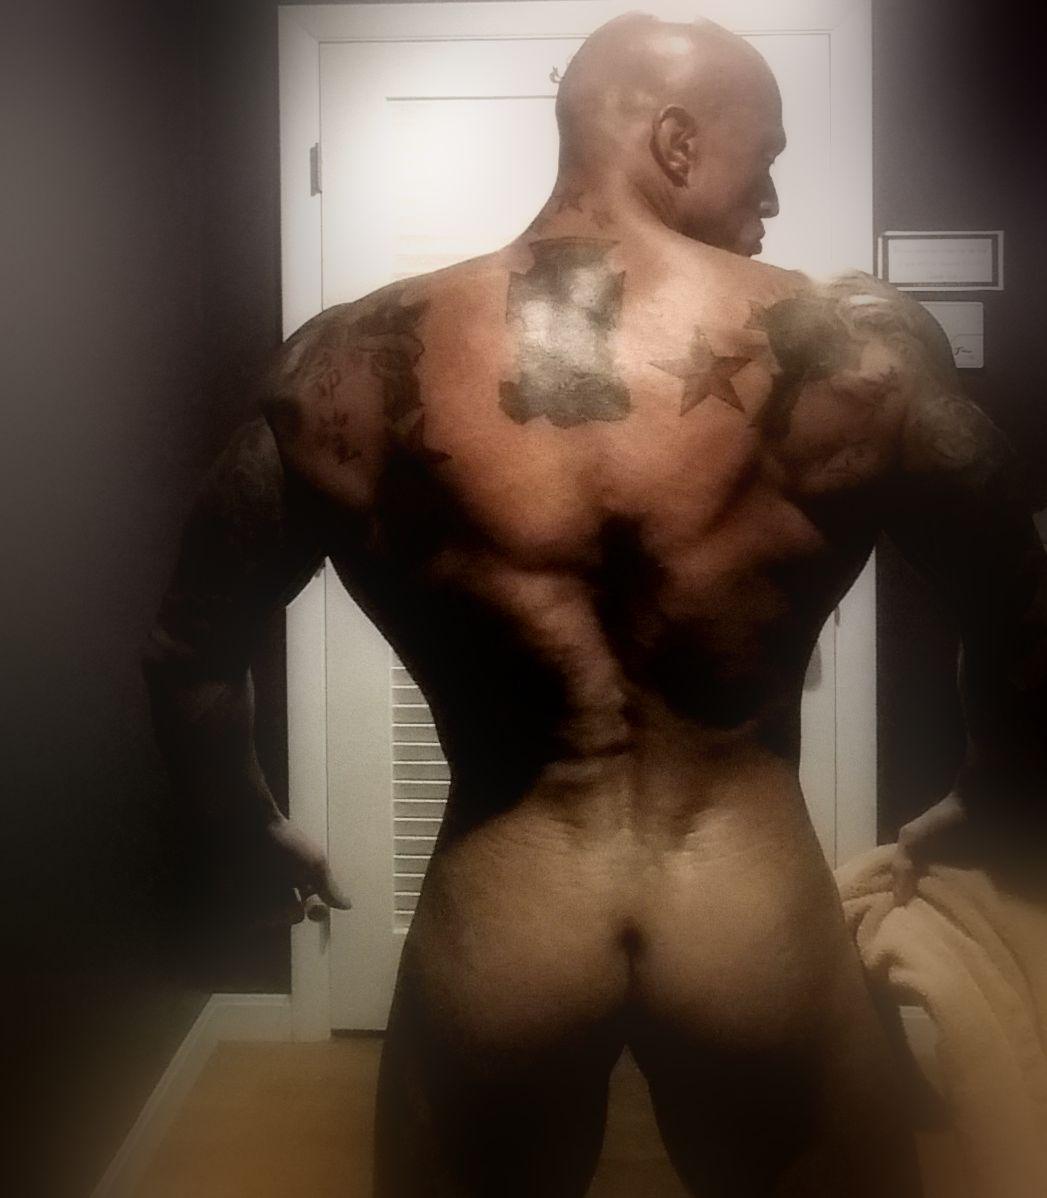 Tattooed Erotic Romance & Physique Model John Joseph Quinlan 14' #JohnQuinlan